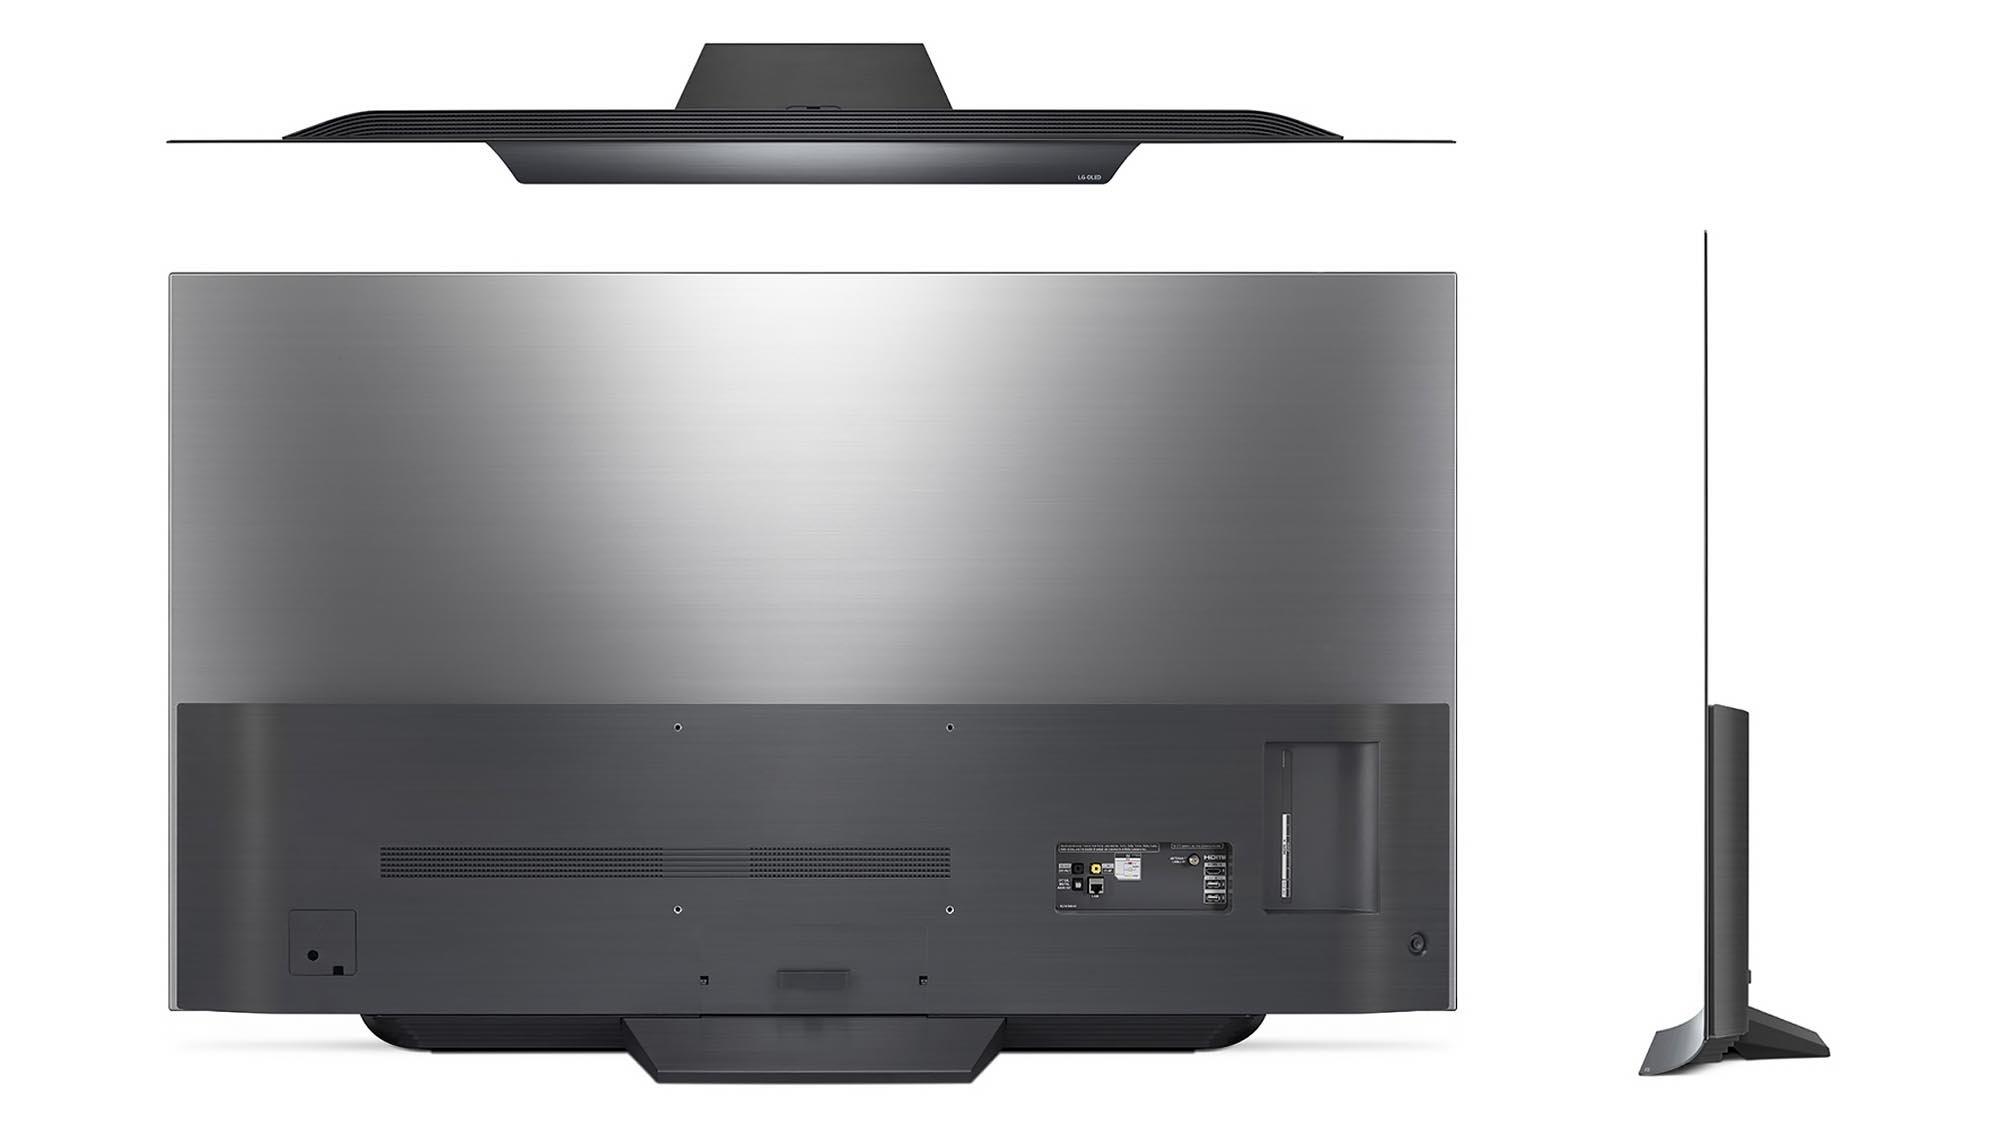 LG OLED77C8 (C8 OLED) review: Another world-beating OLED